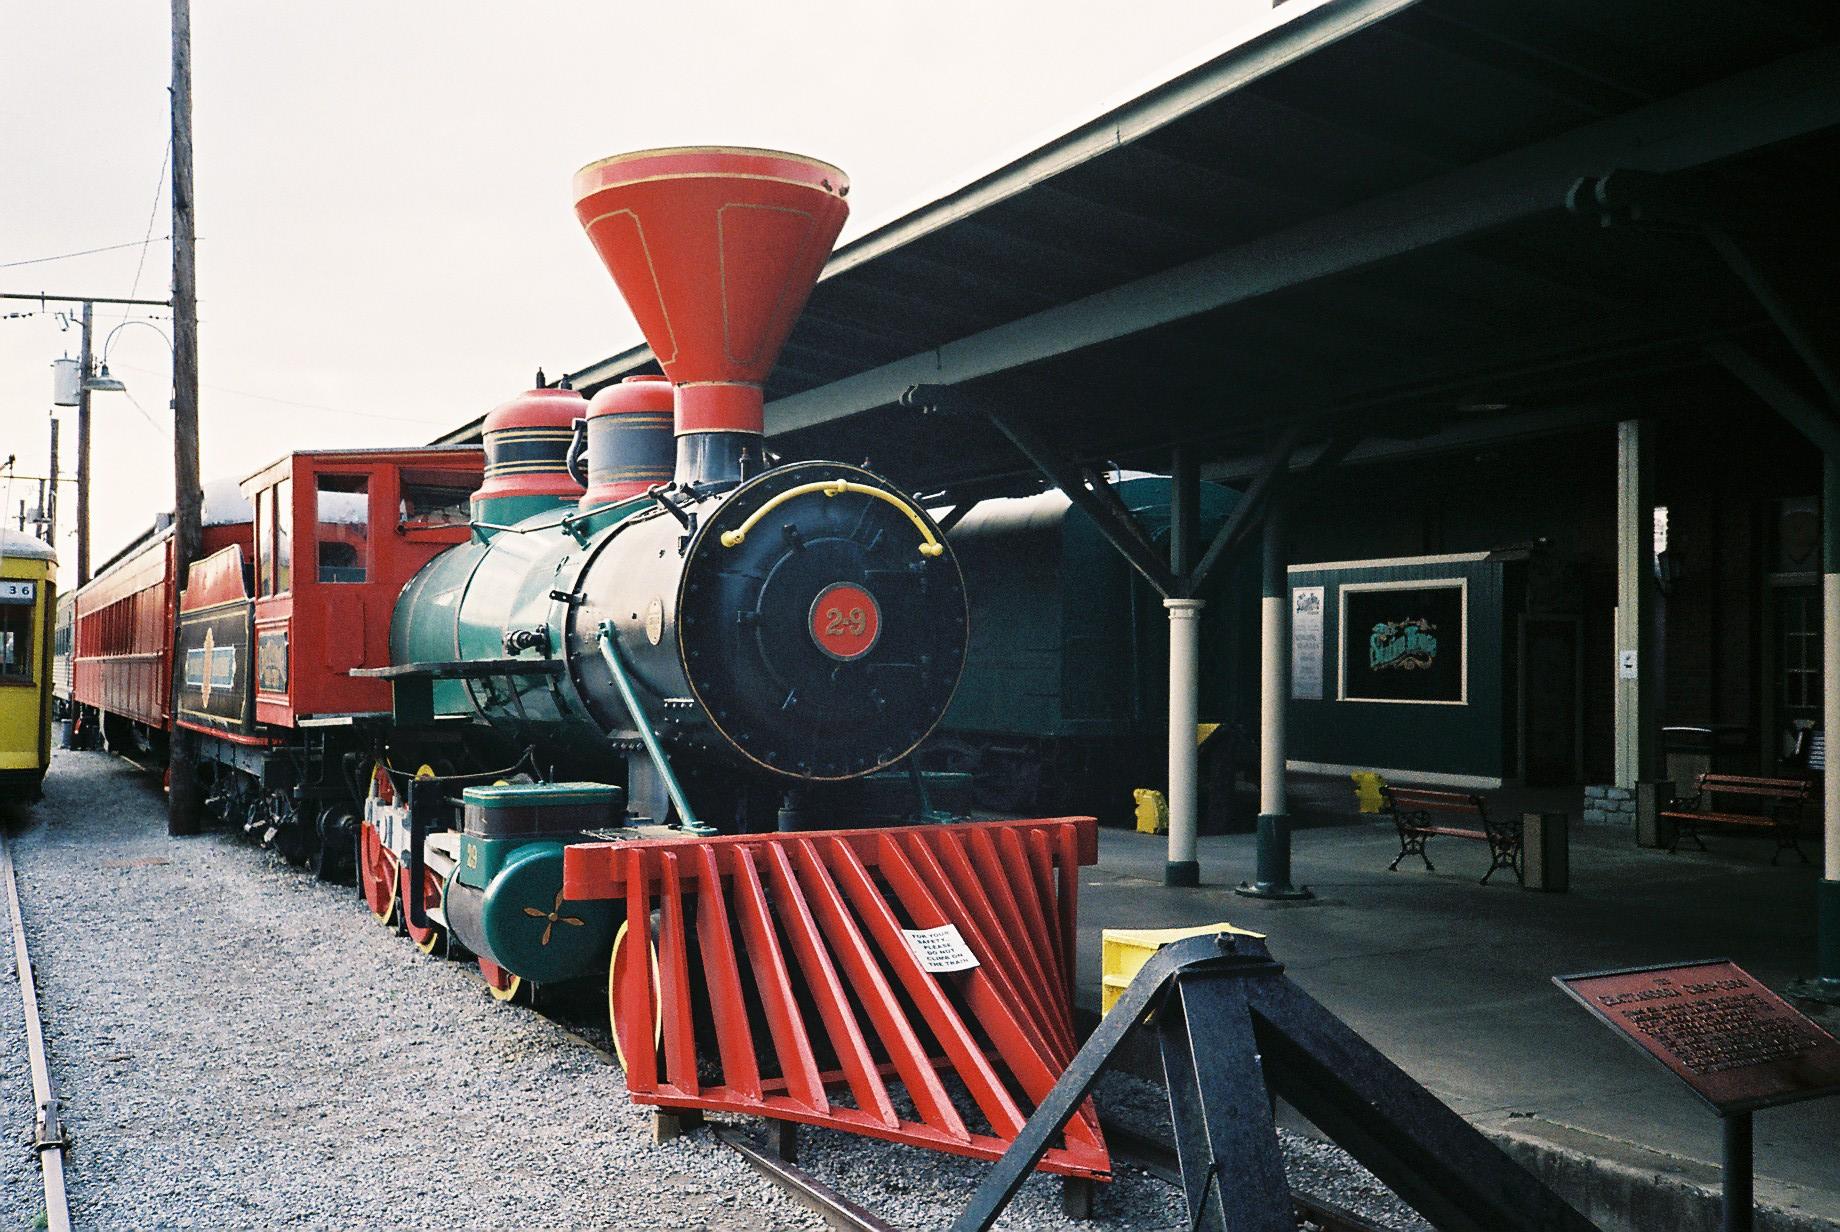 old train engine at the chattanooga choo choo hotel